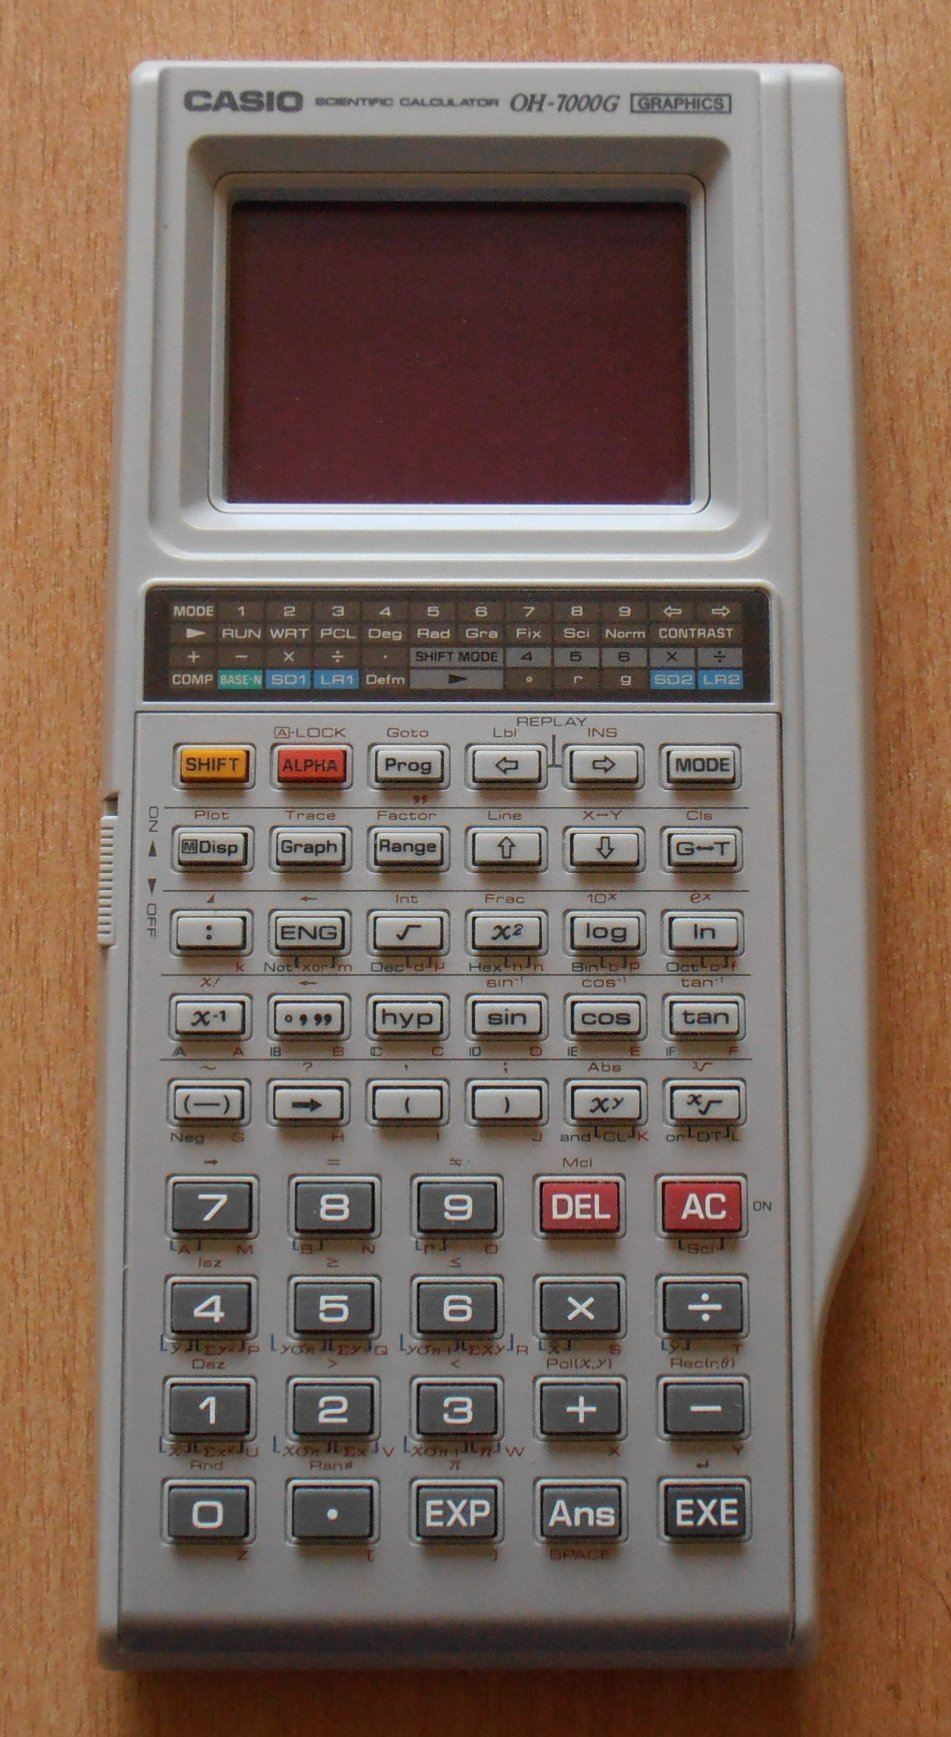 Casio OH-7000G